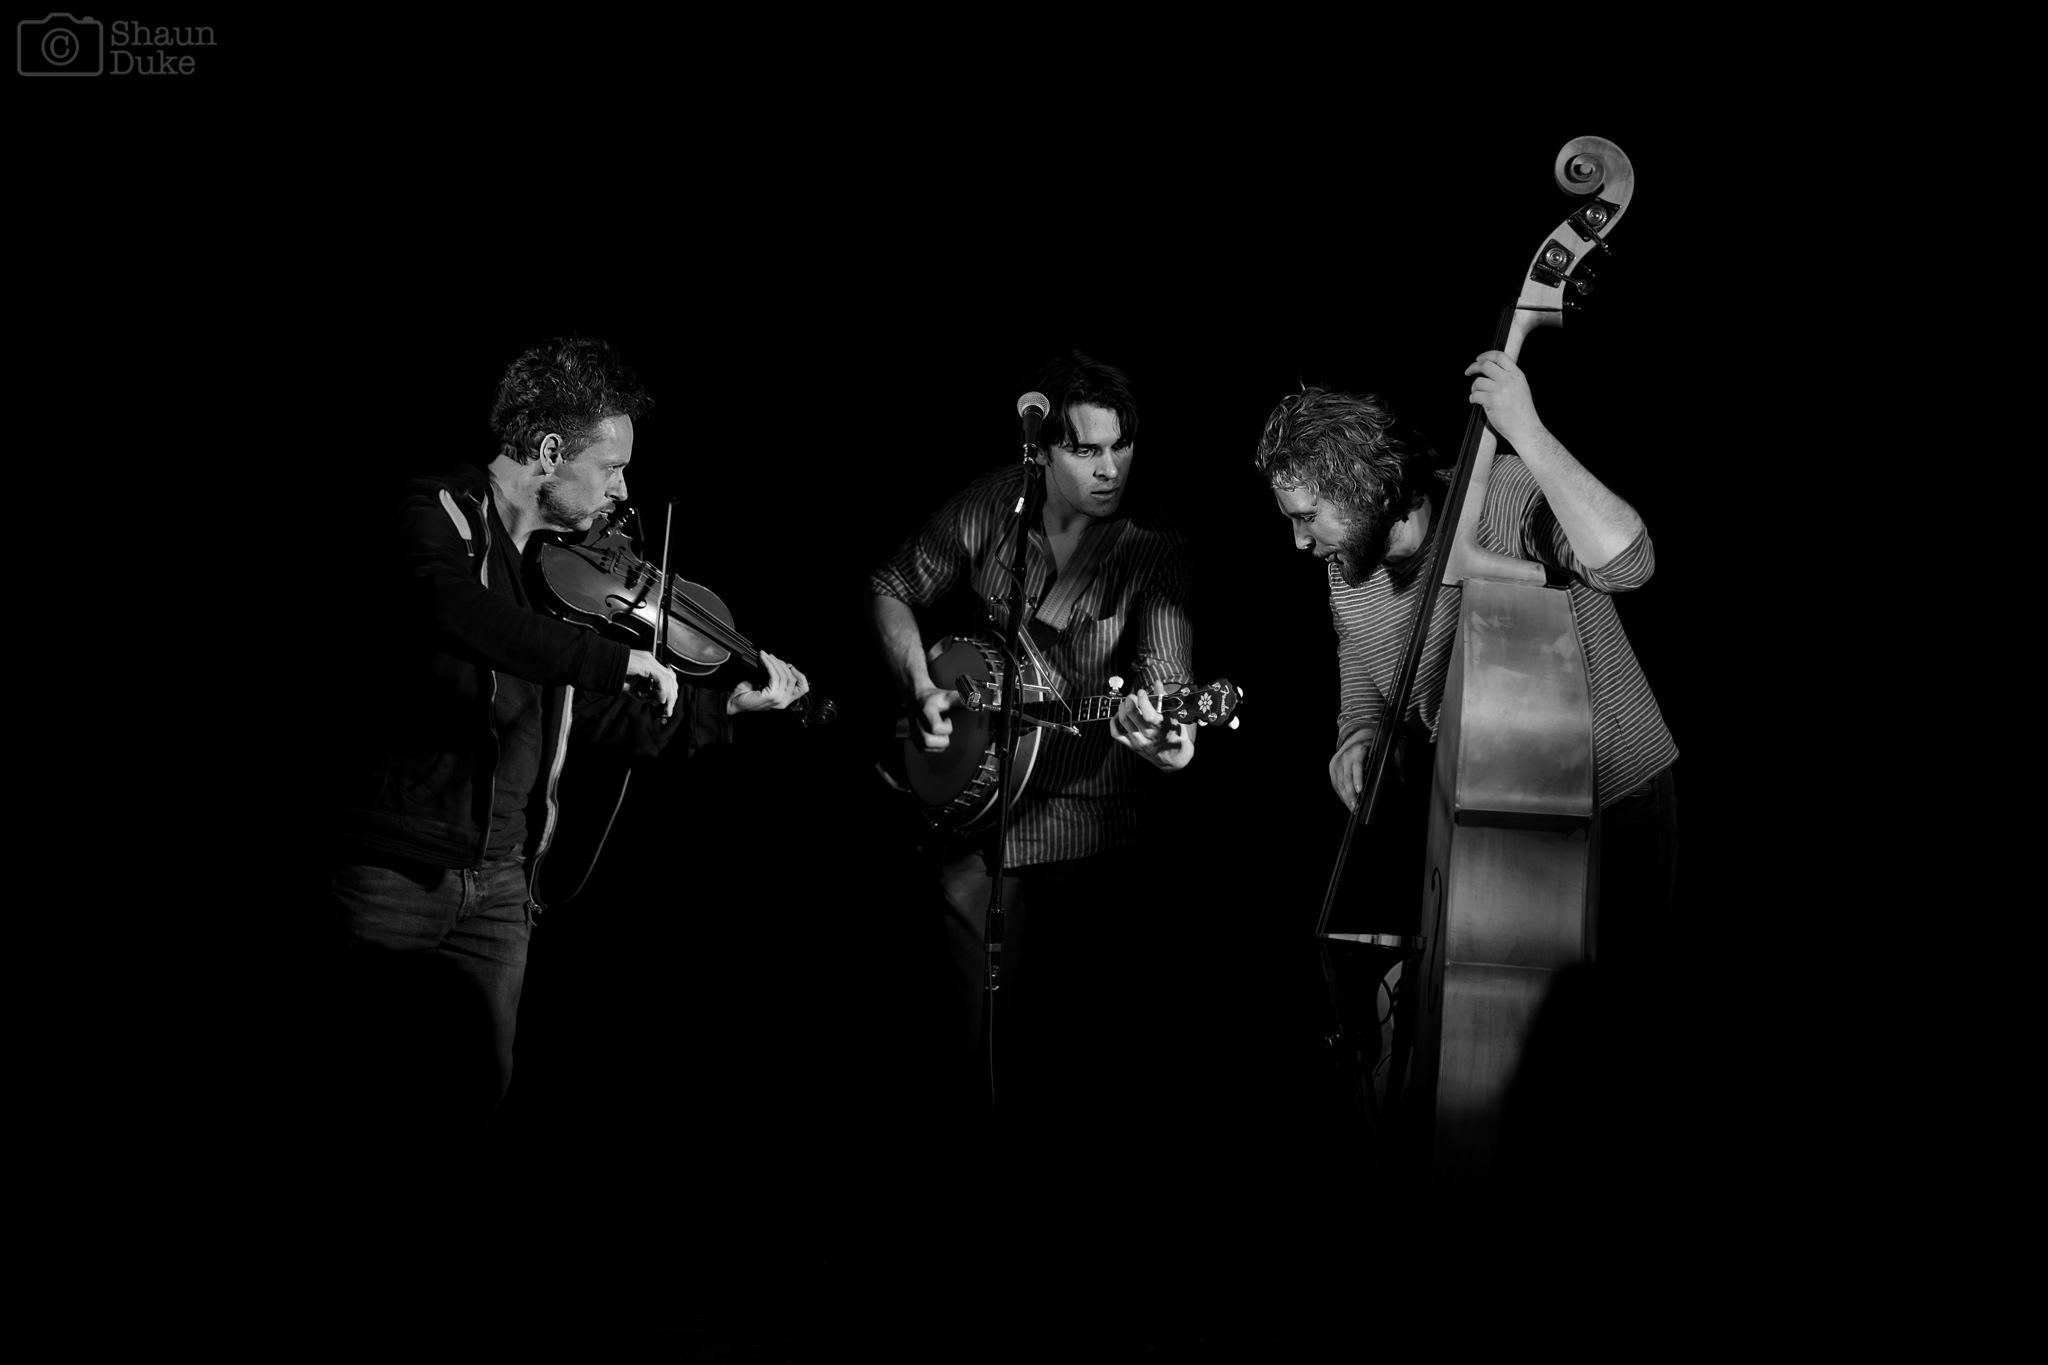 The Mantic Muddlers by Shaun Duke LRPS